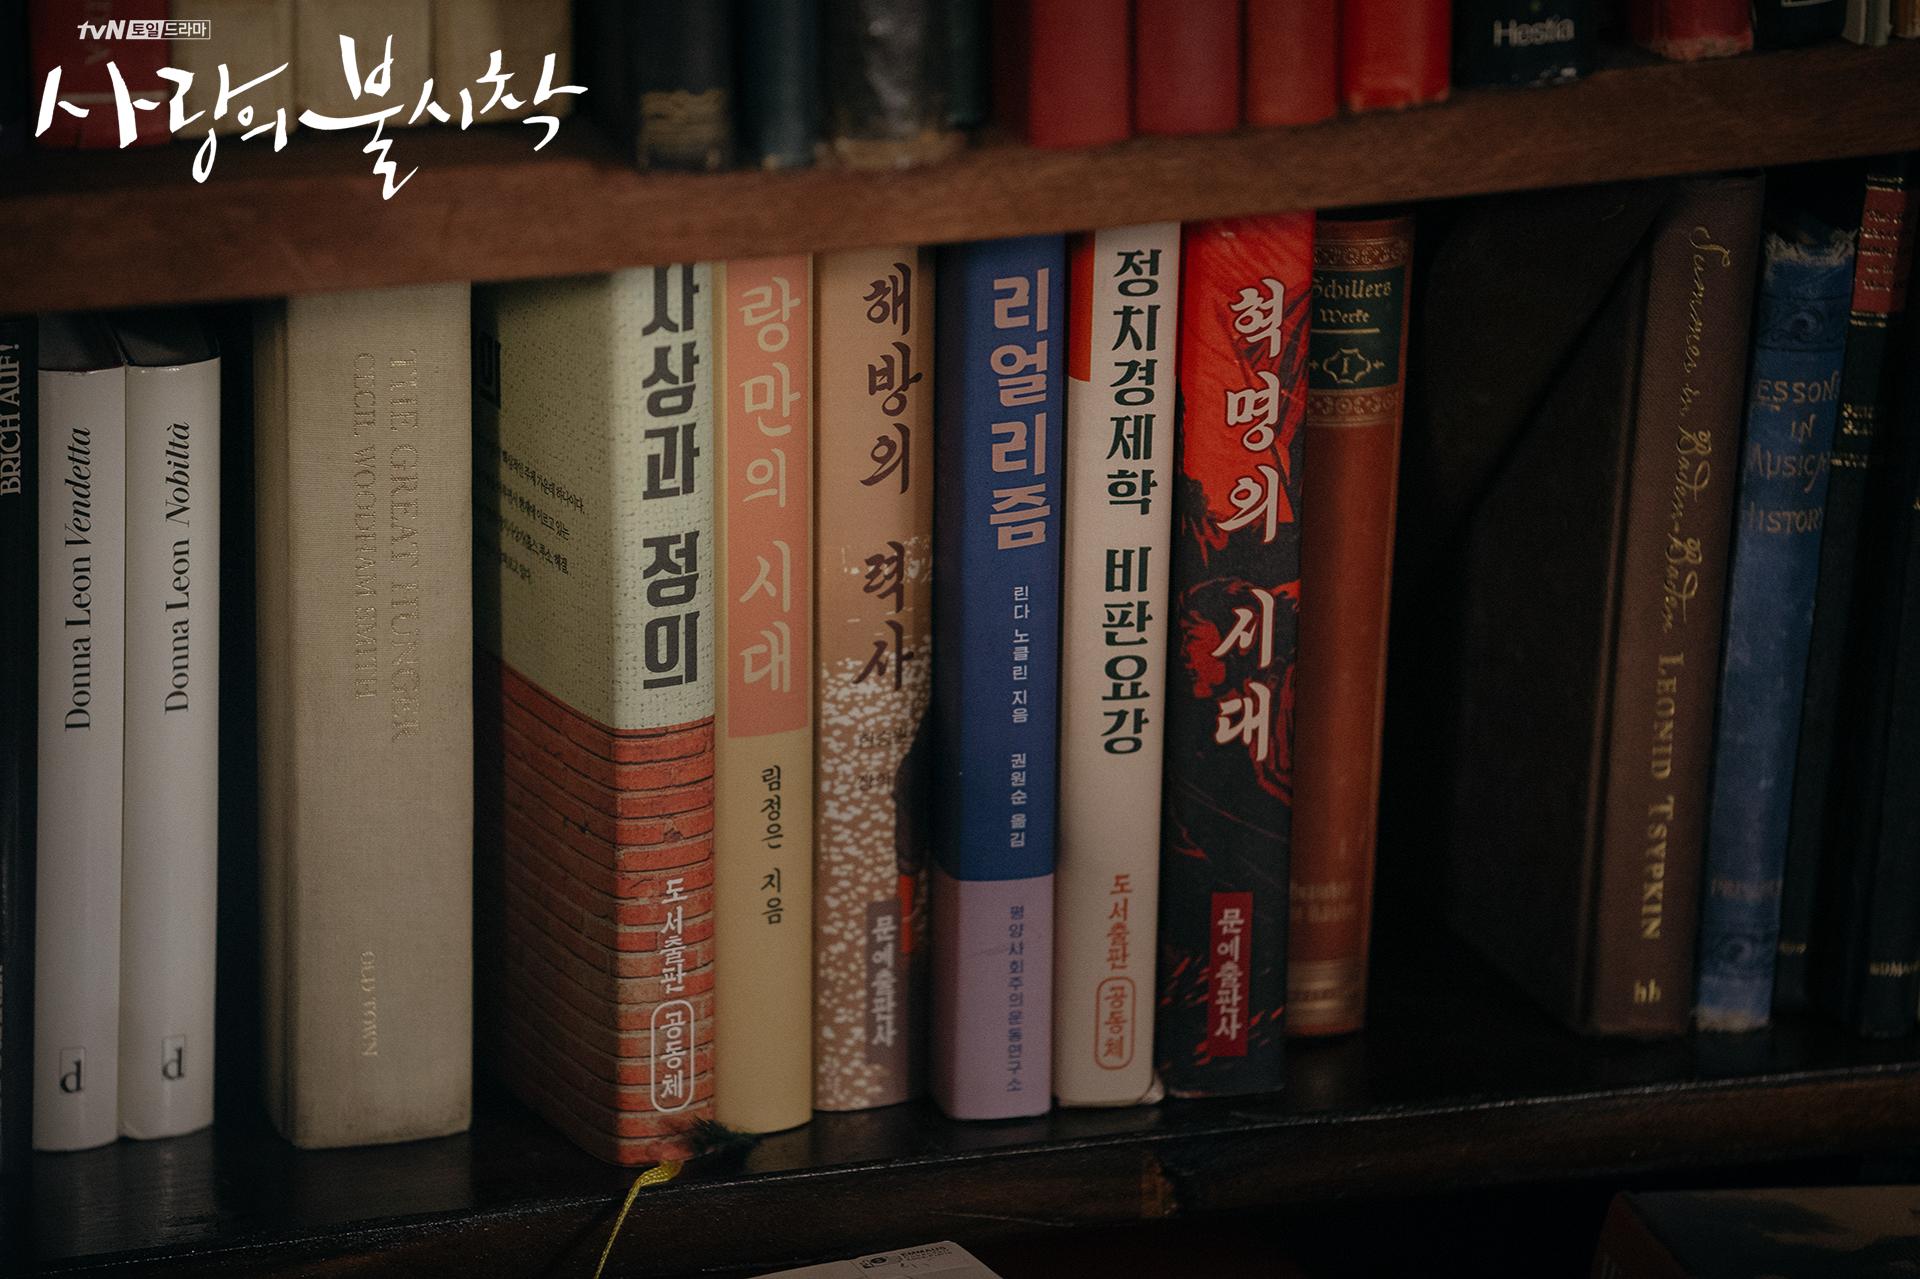 Crash Landing on You Yoon Se-ri organized books to say I love you Ri Jeong-hyeok